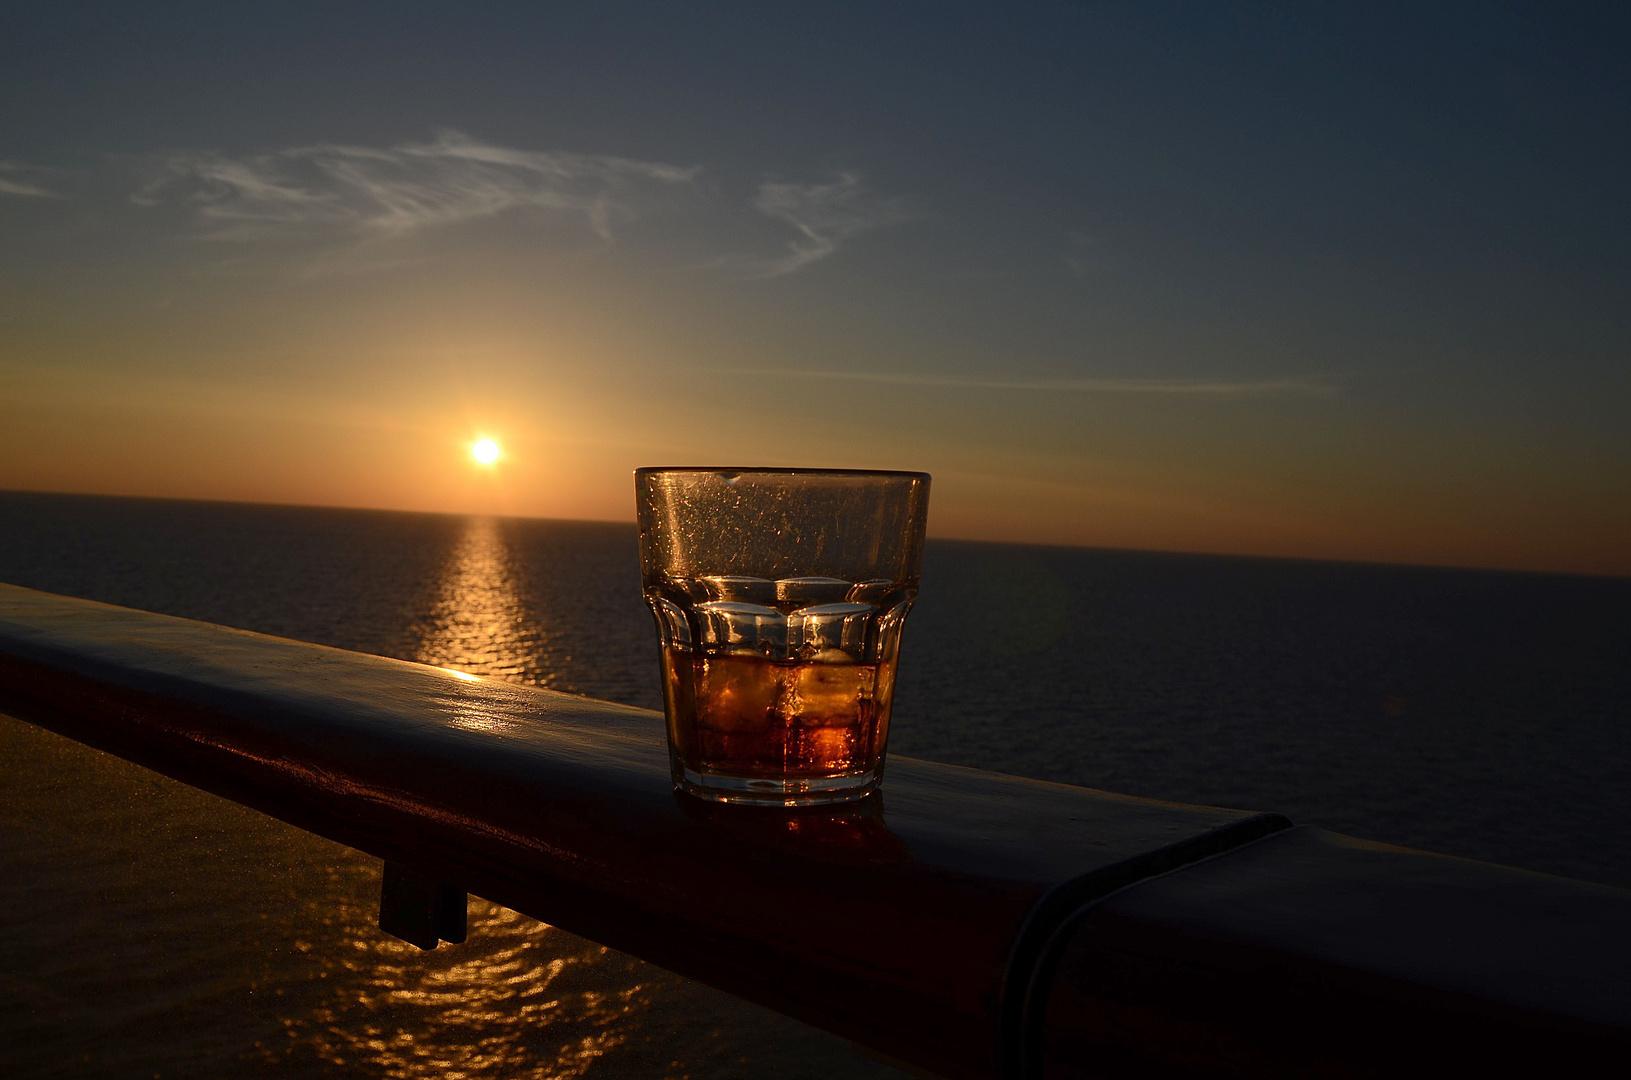 Sonnenuntergang...entspannt